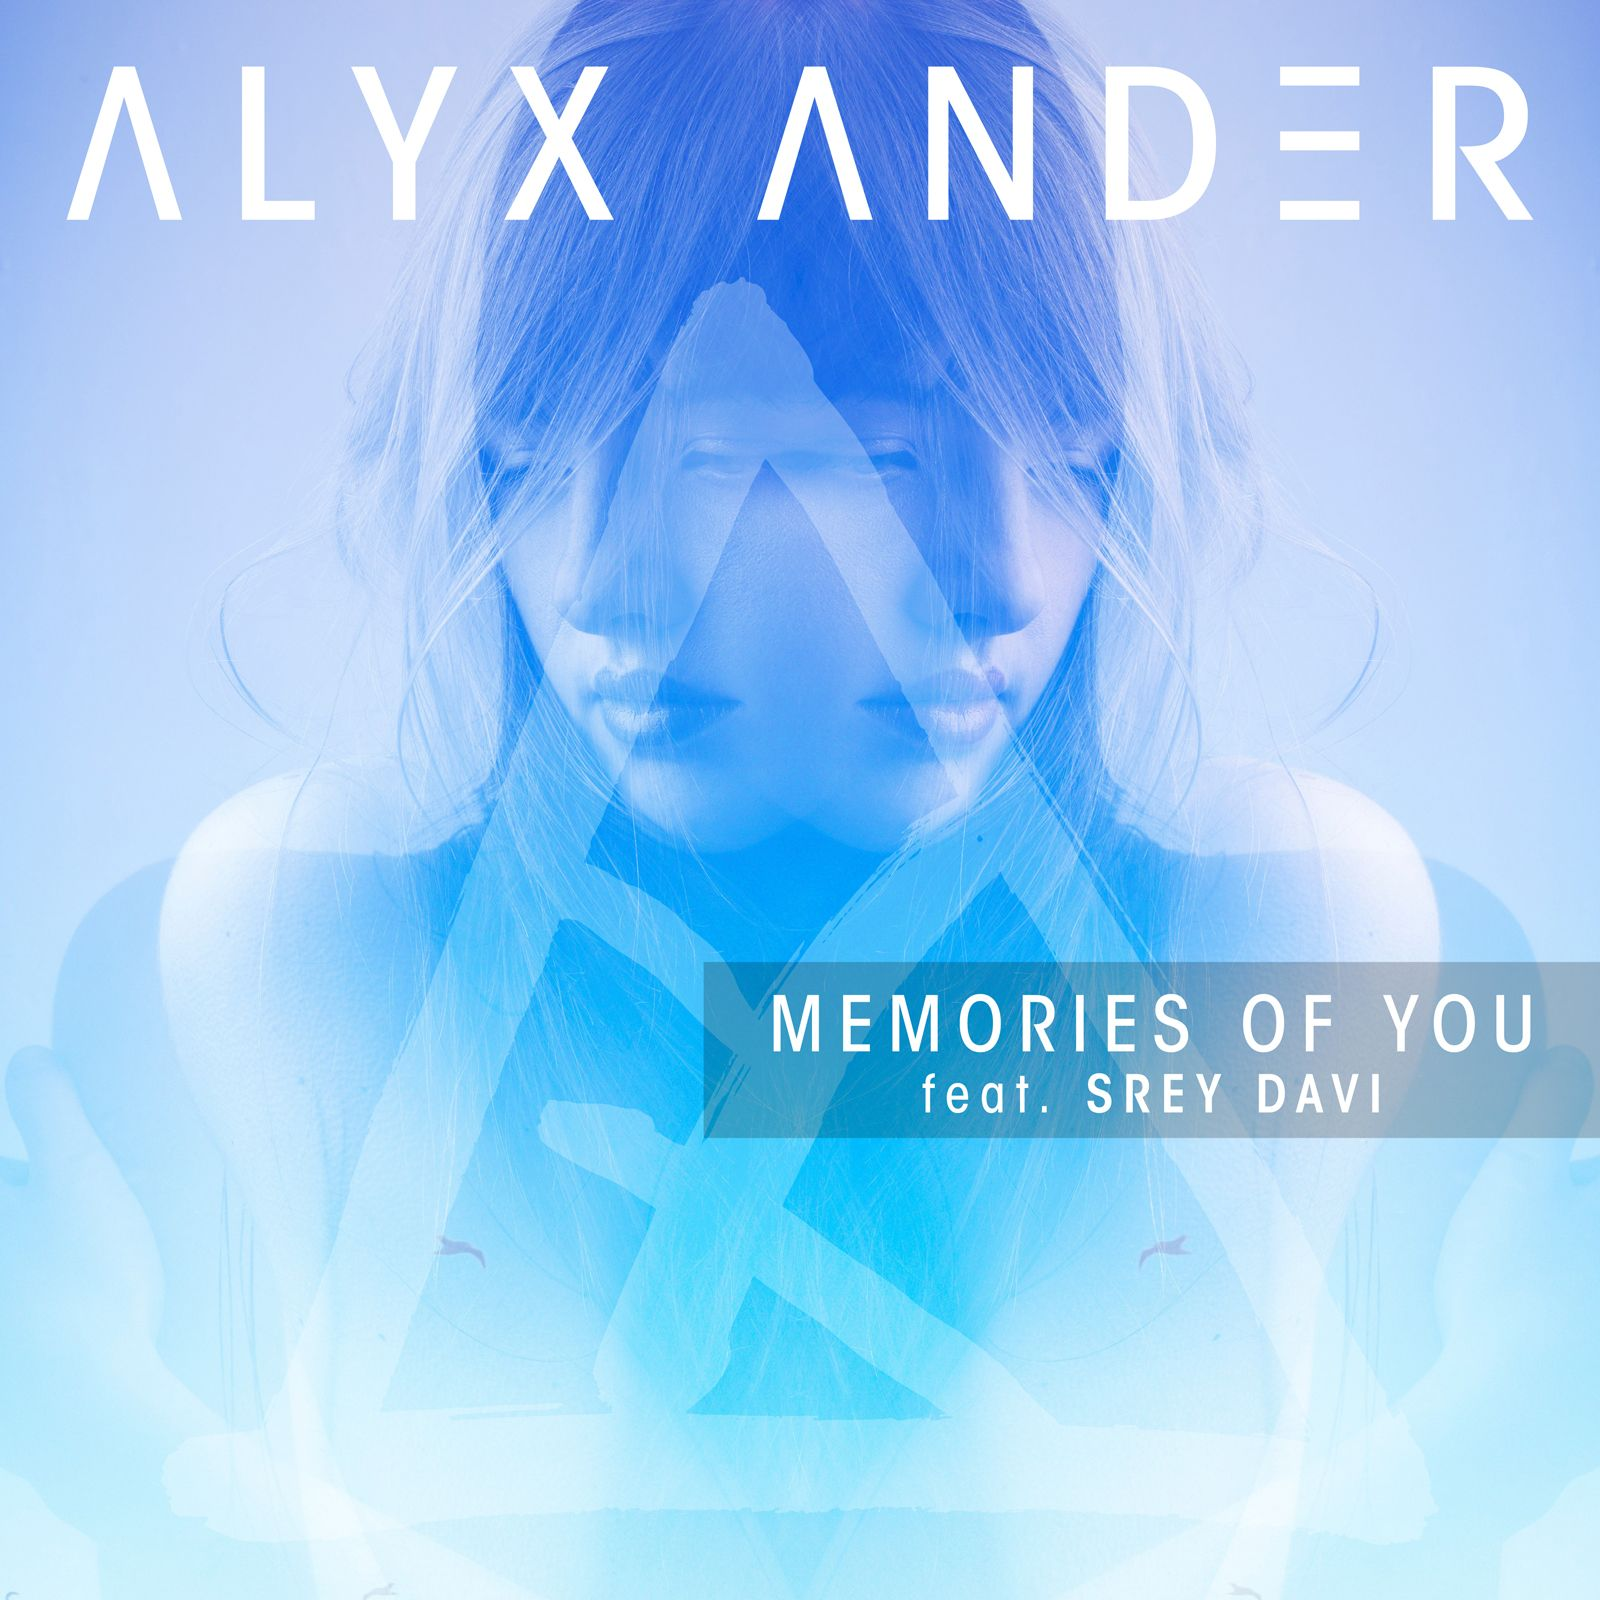 alyxander_memories_1600.jpg